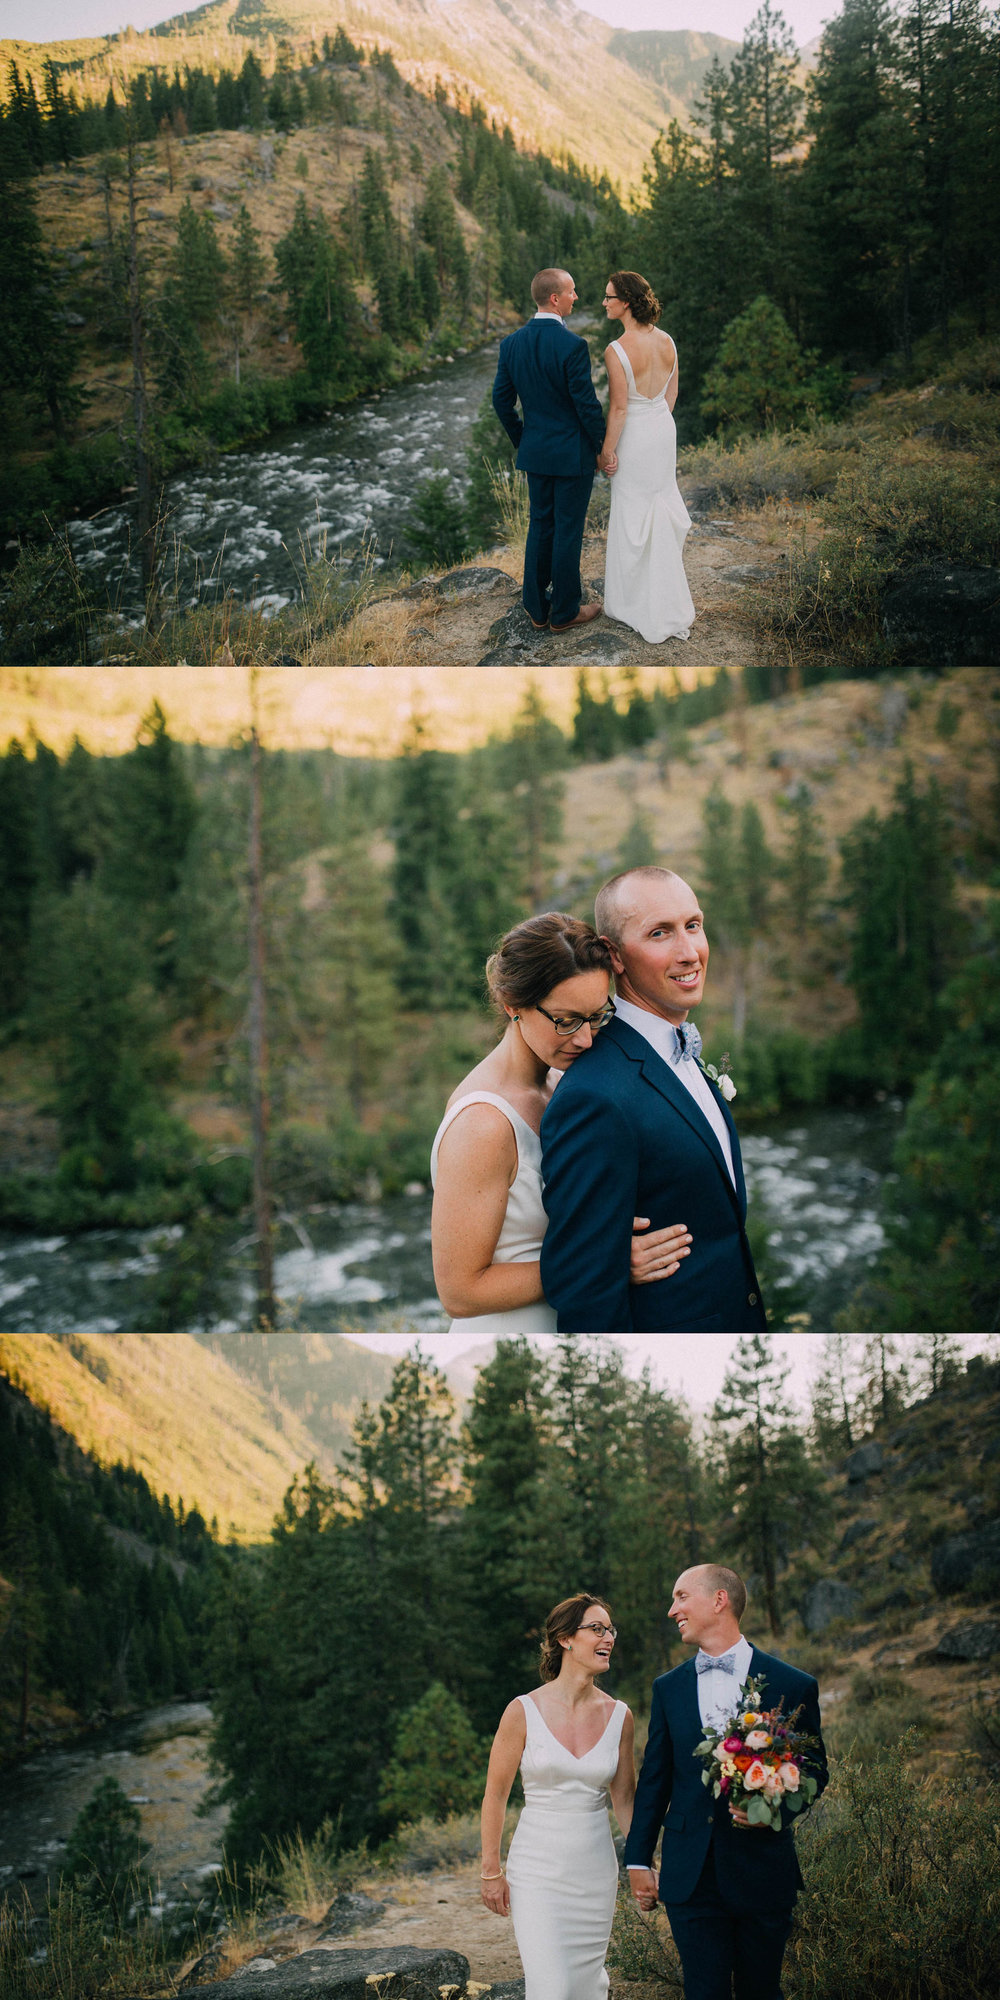 seattle+and+pacific+northwest+wedding+photographer+western+washington+wedding-30.jpg